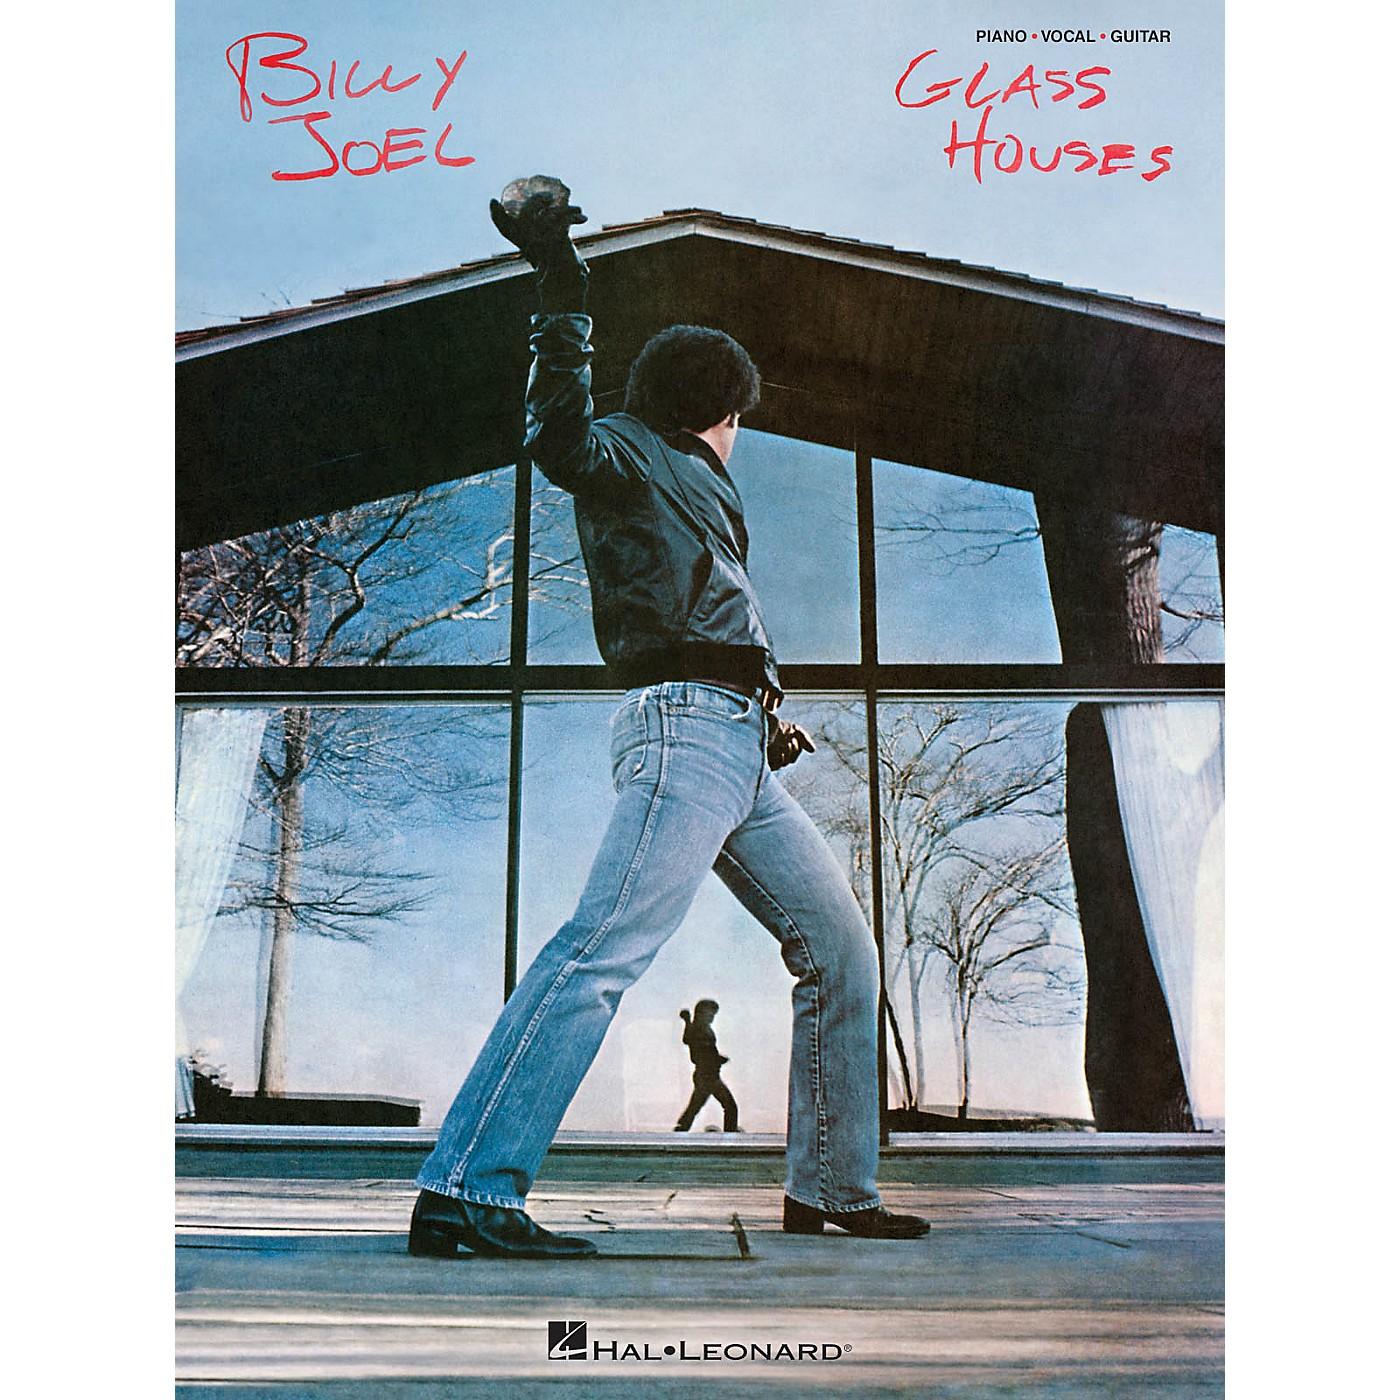 Hal Leonard Billy Joel - Glass Houses Piano/Vocal/Guitar Songbook thumbnail